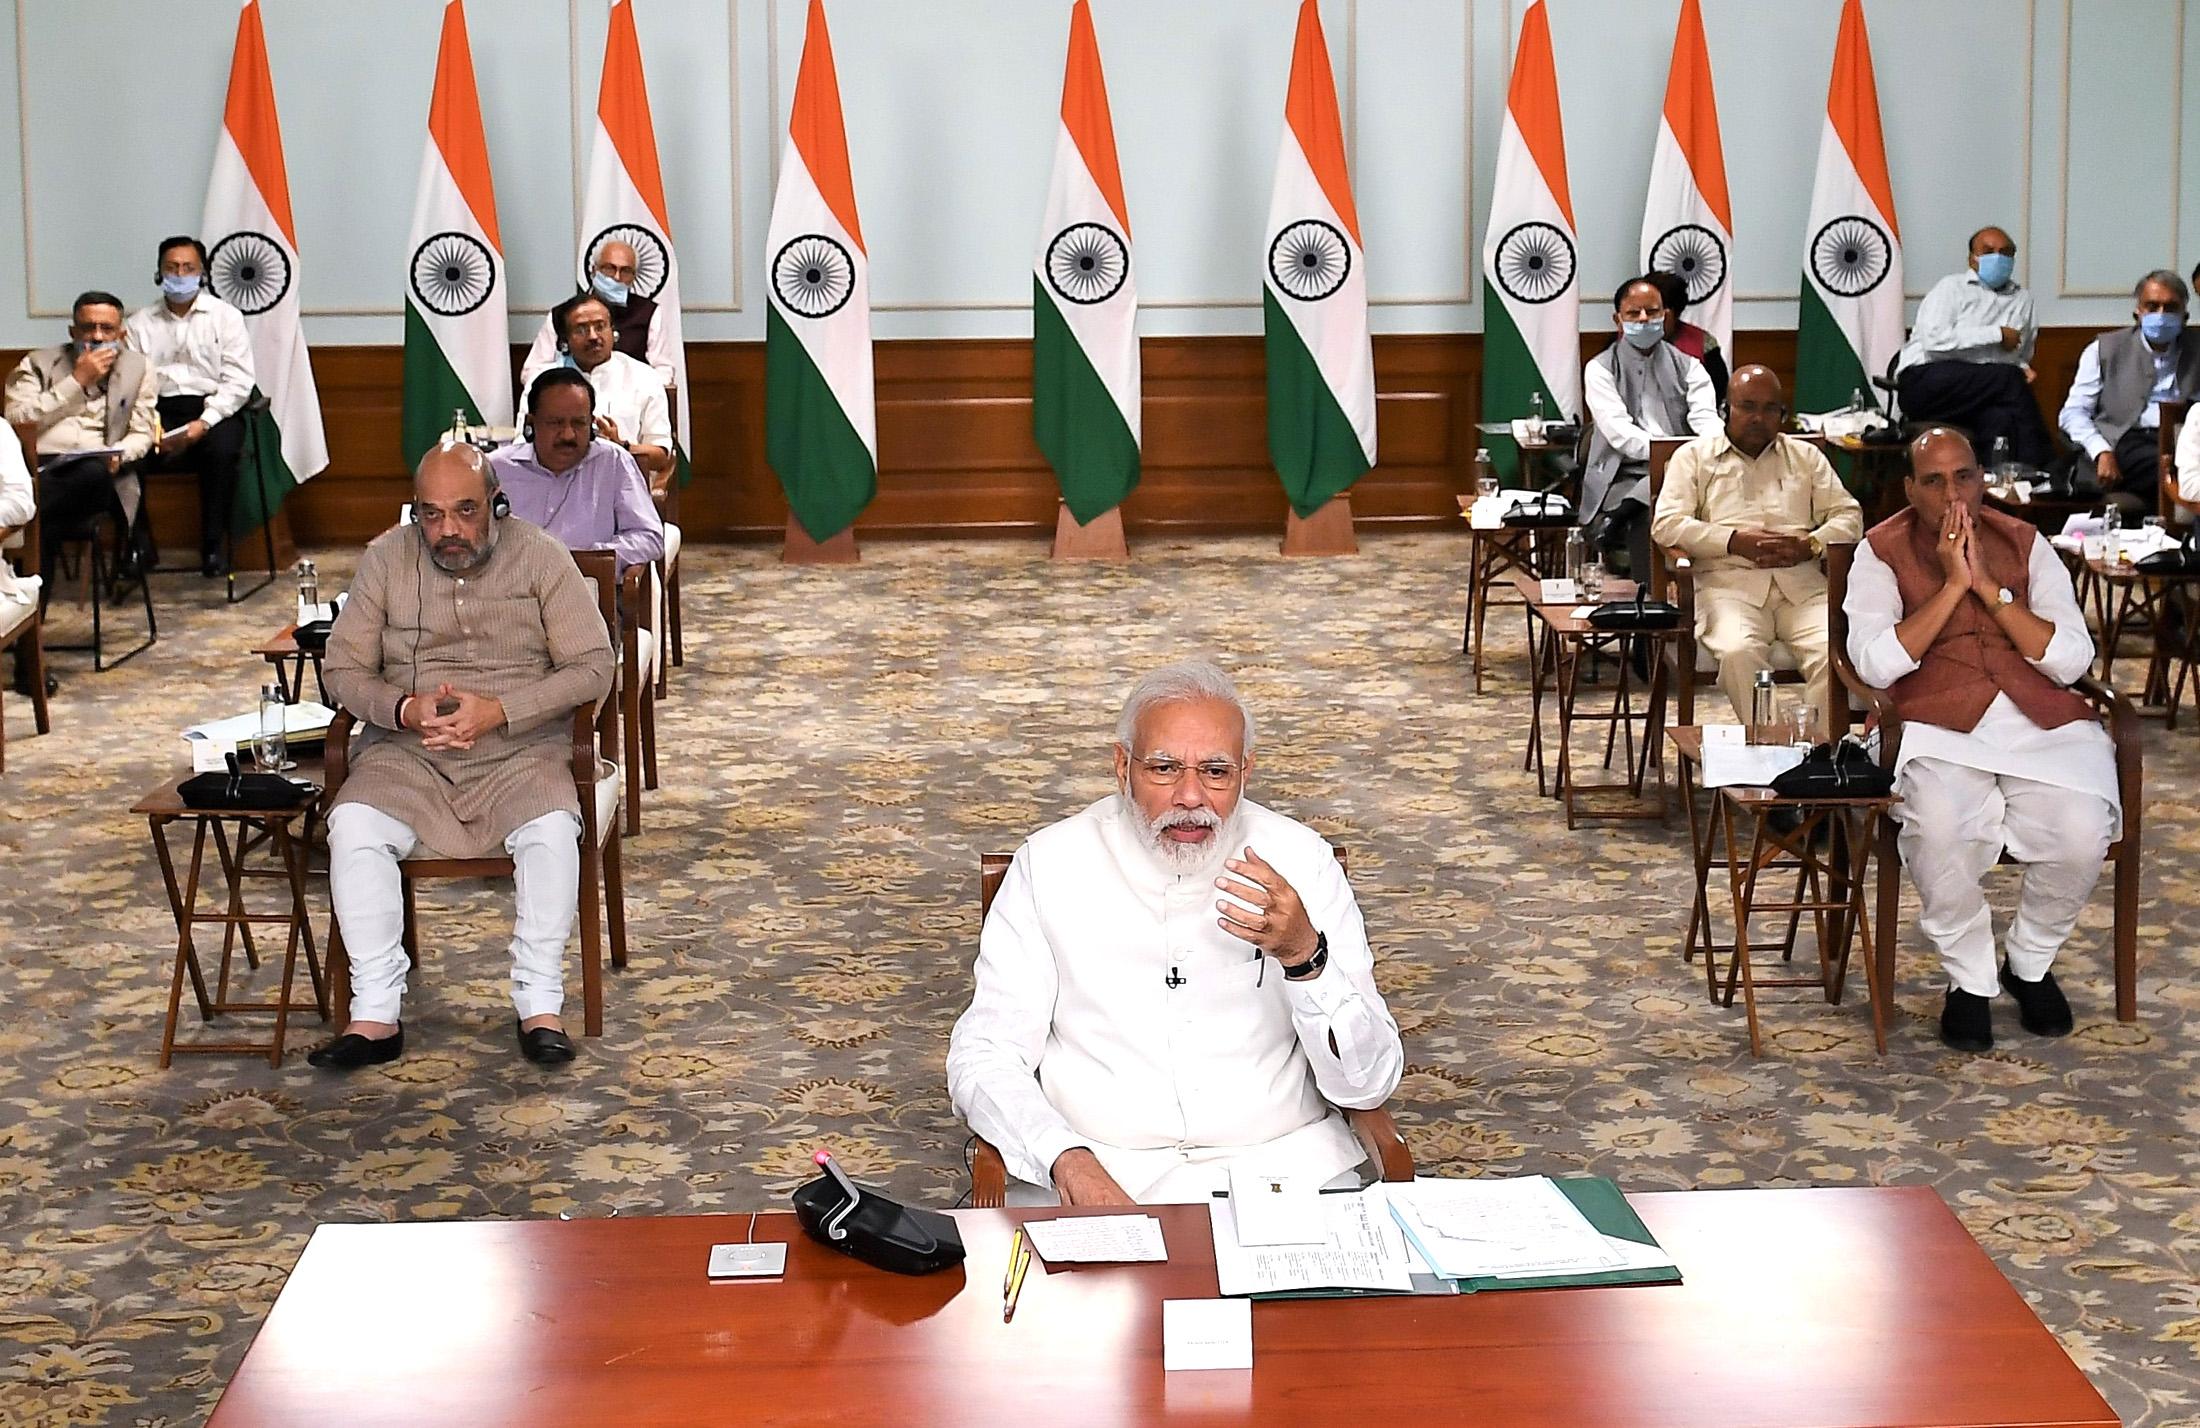 Modi pledges economic package worth Rs 20 lakh crore to tide over Covid crisis